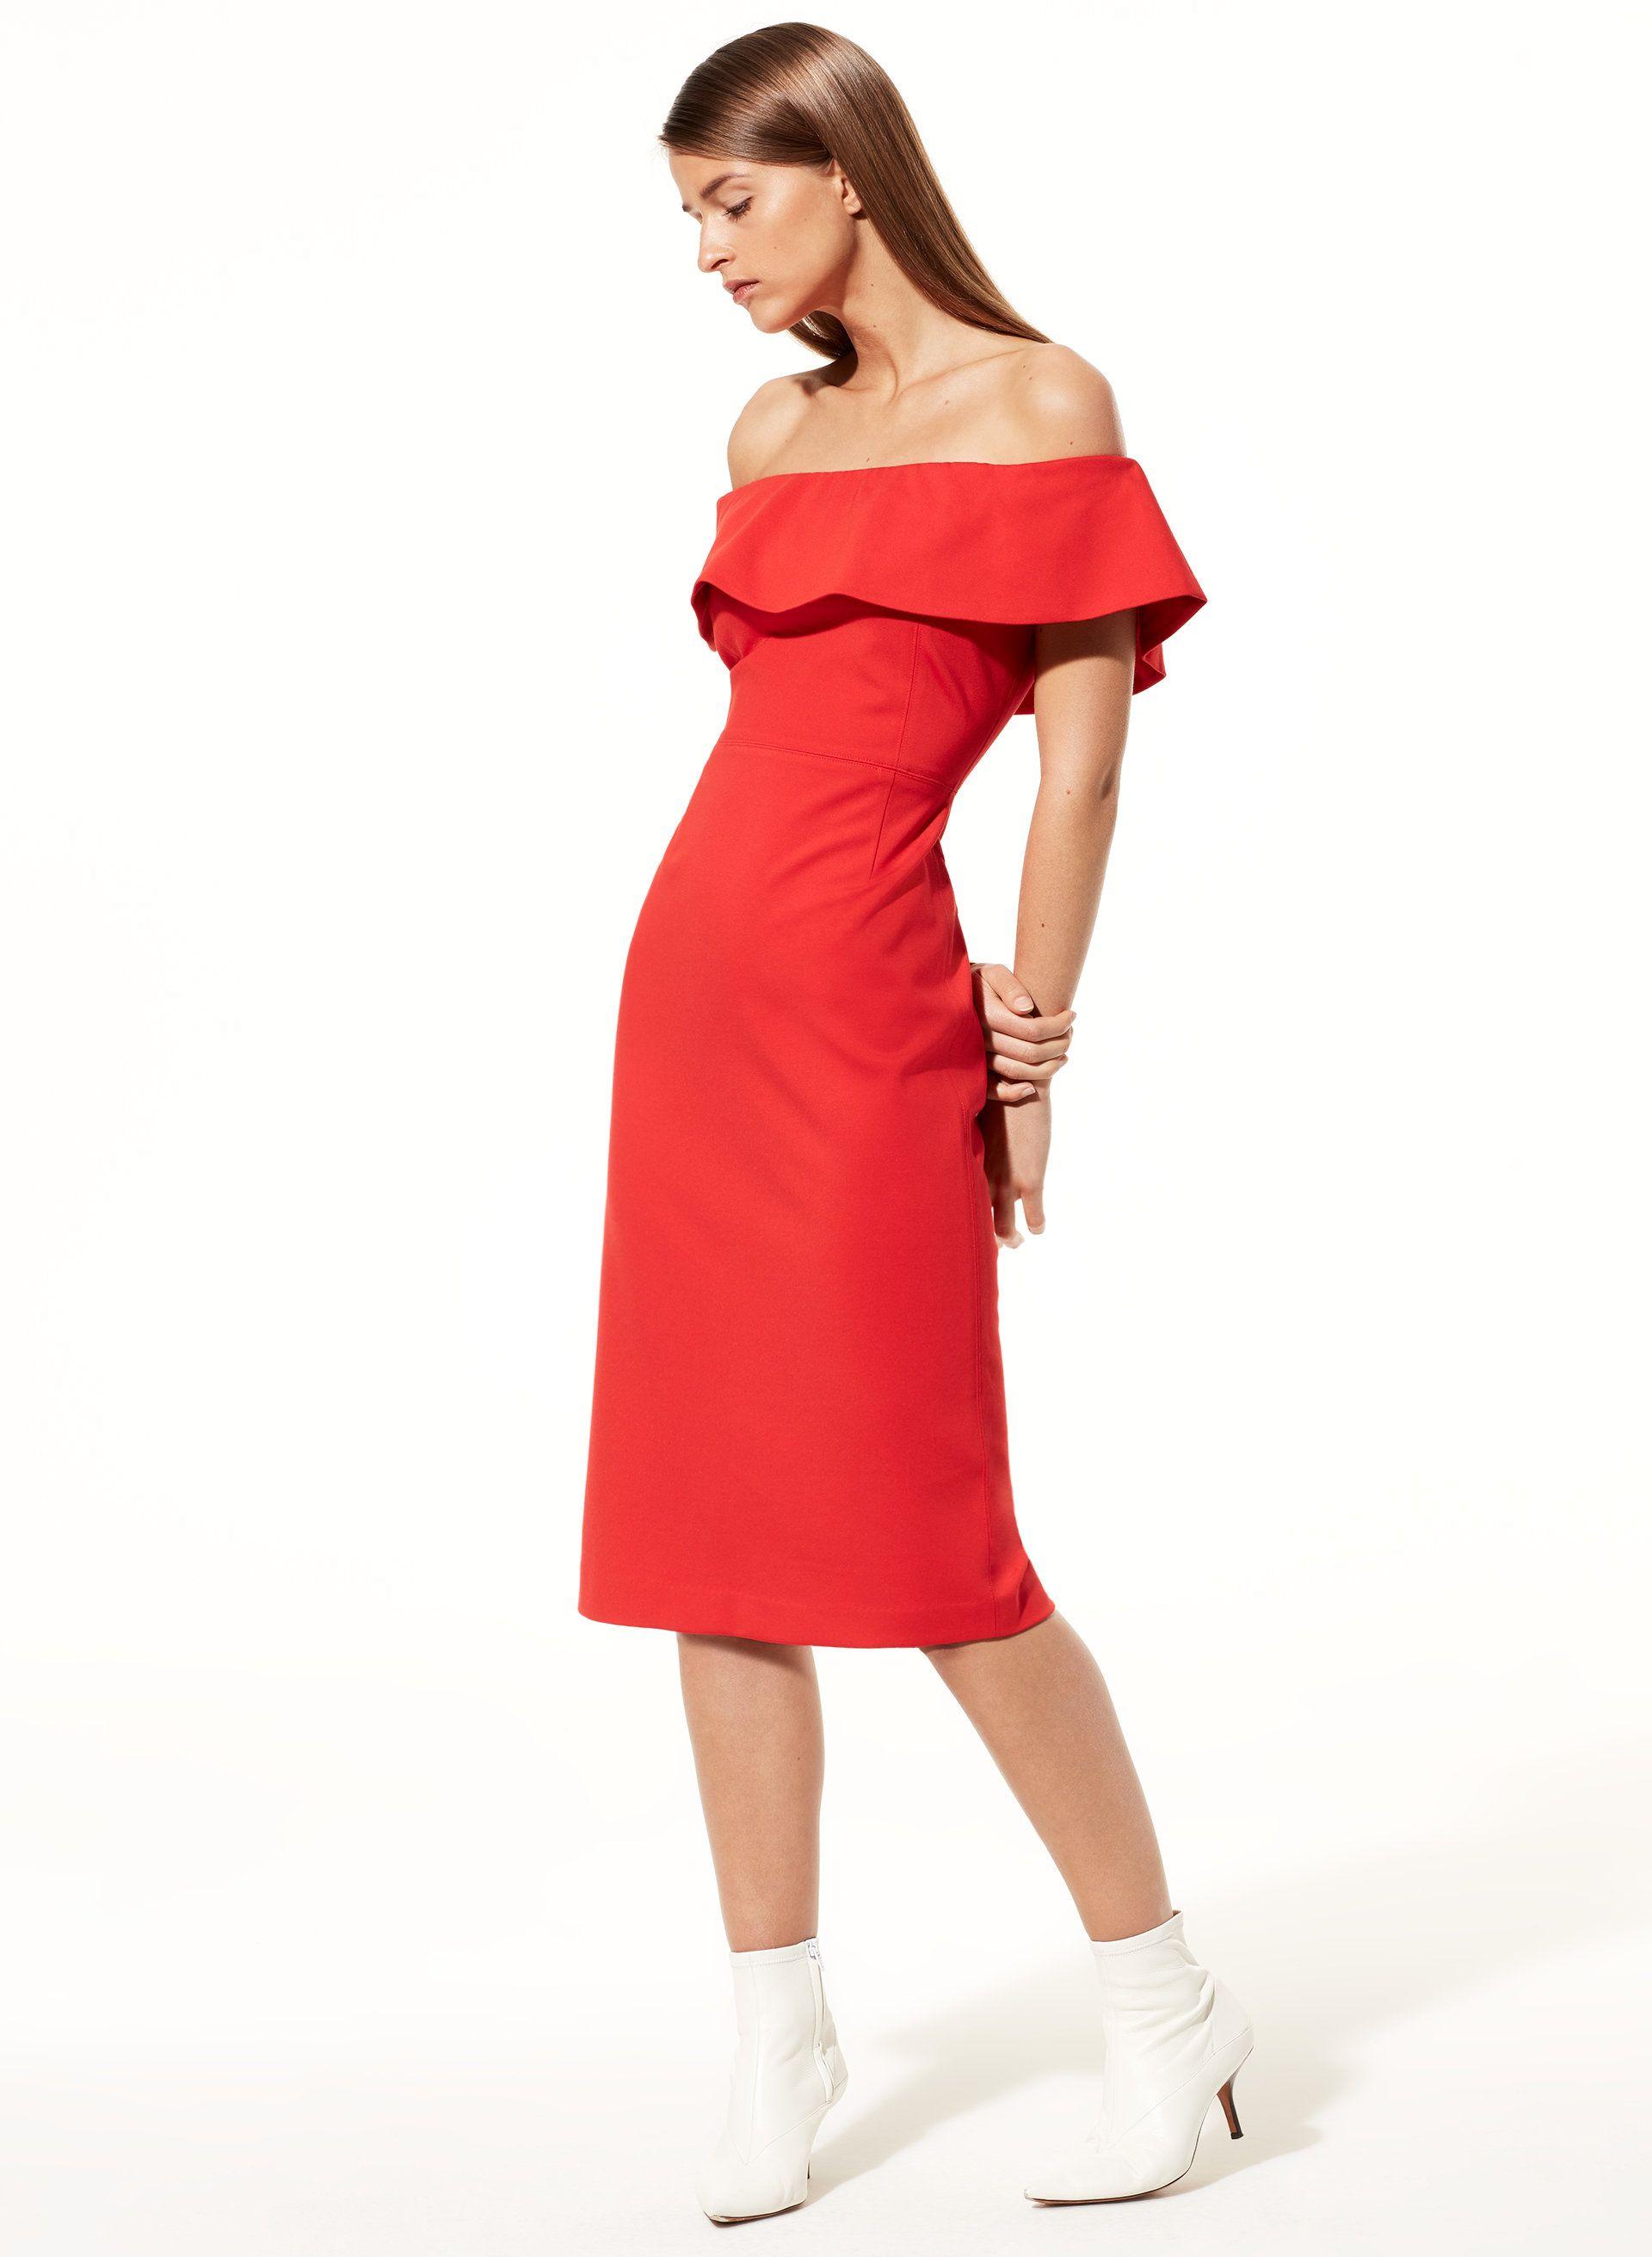 983b11cb68 Ruslan dress   dresses   Dresses, Millenial pink, Spring colors